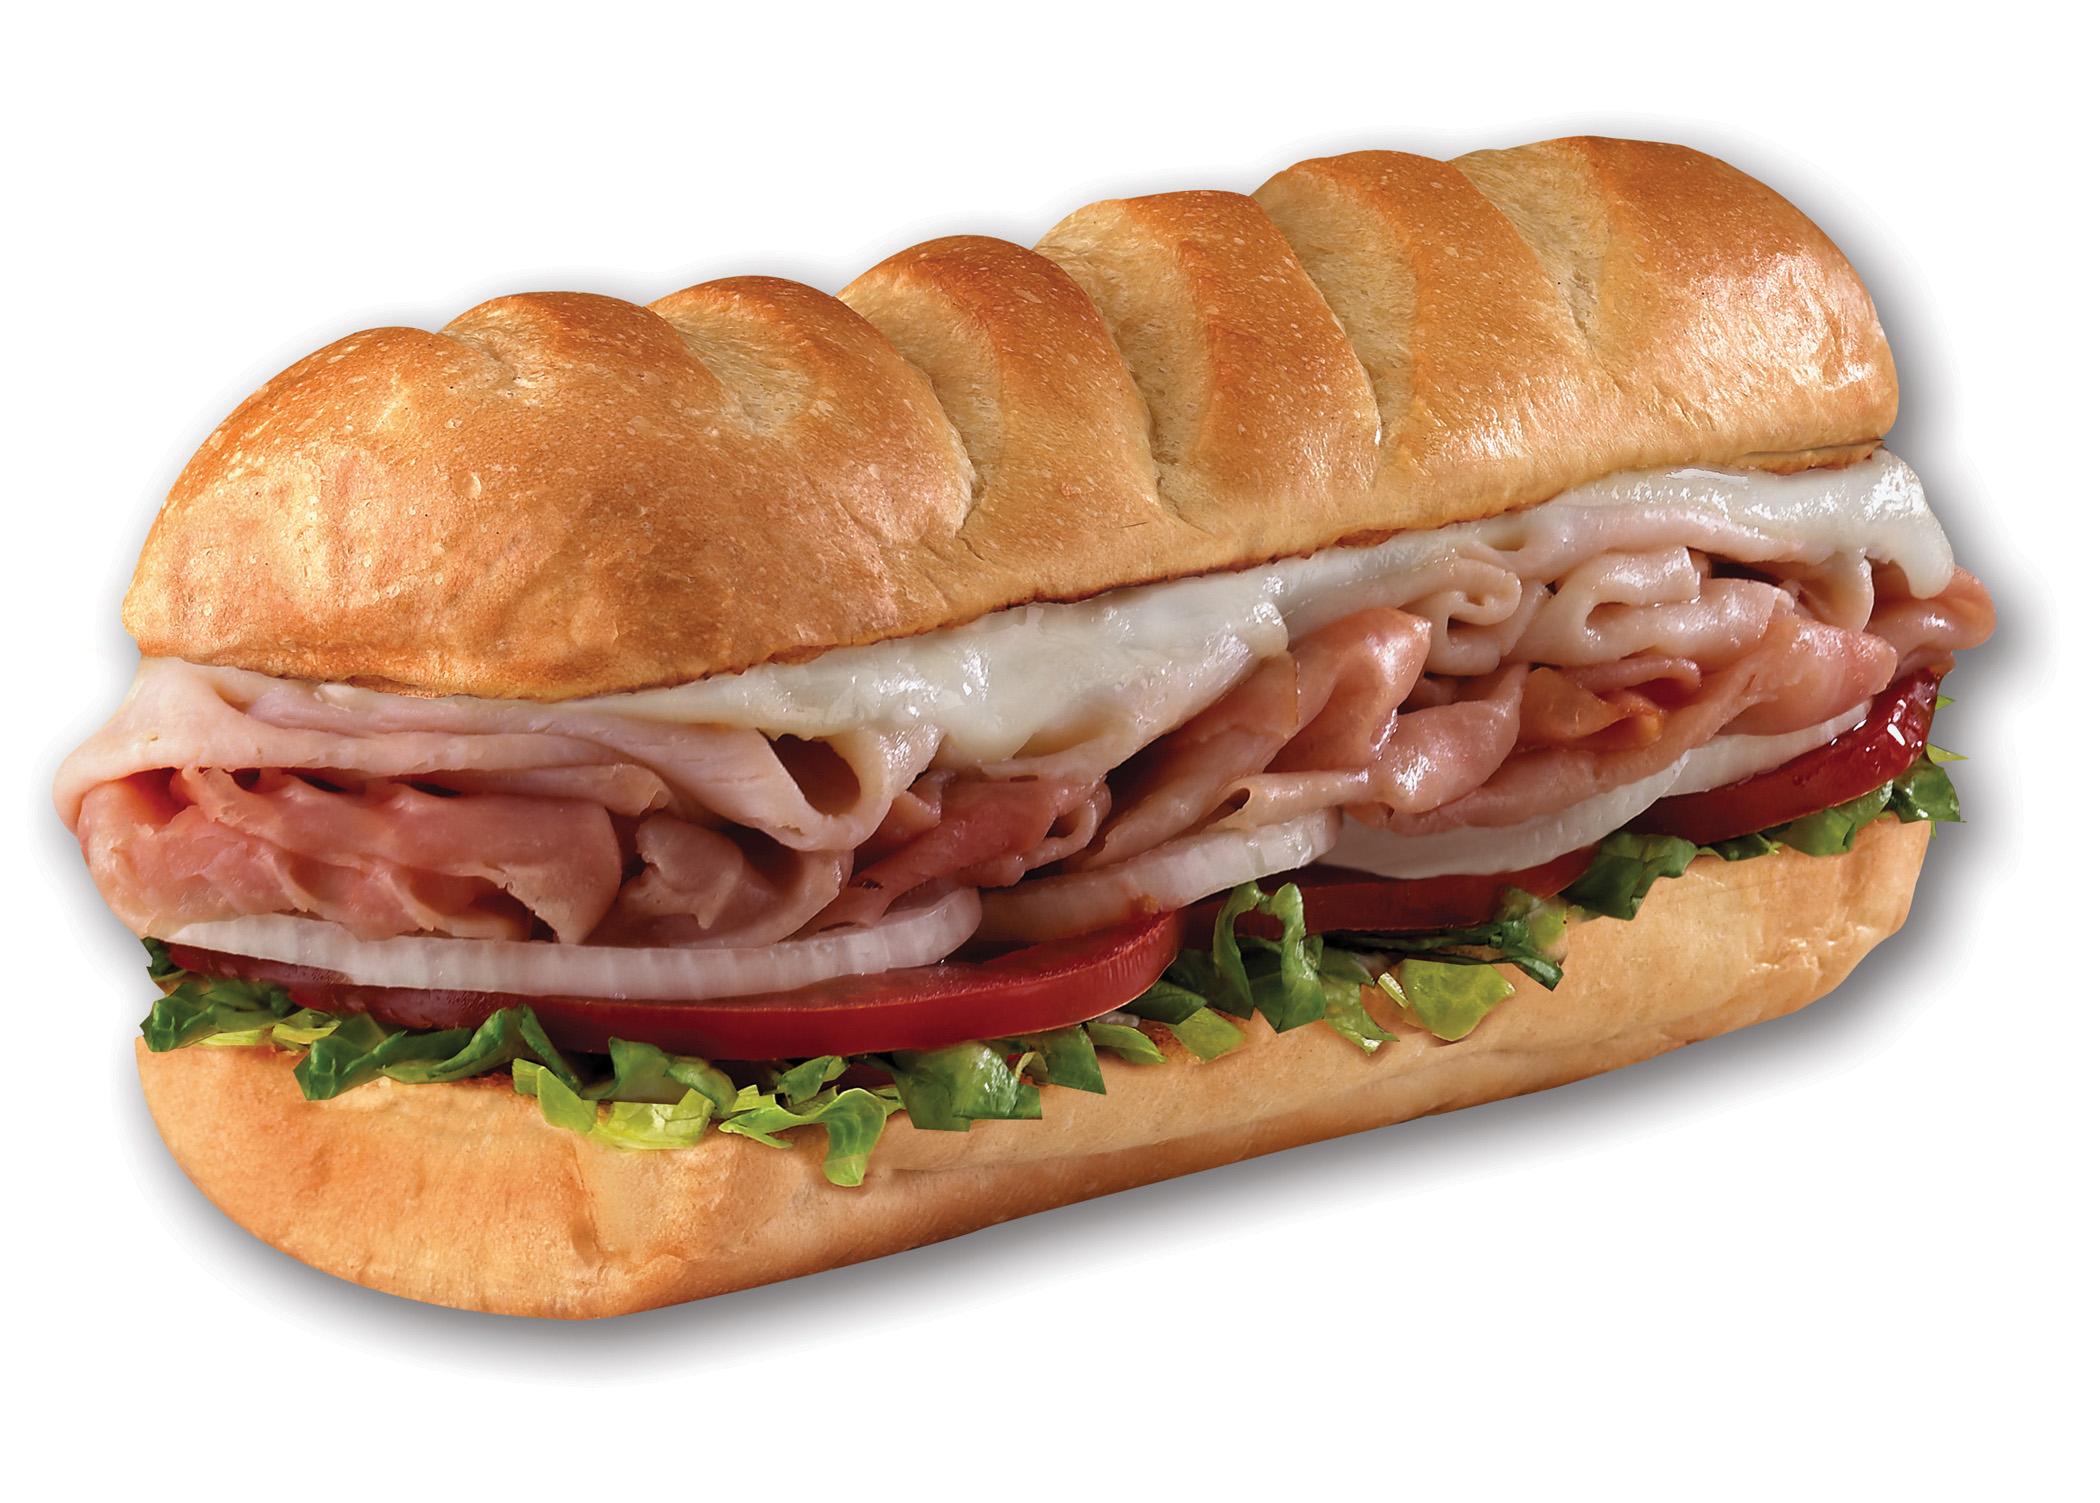 Free Sub Sandwich Png, Download Free Clip Art, Free Clip Art.